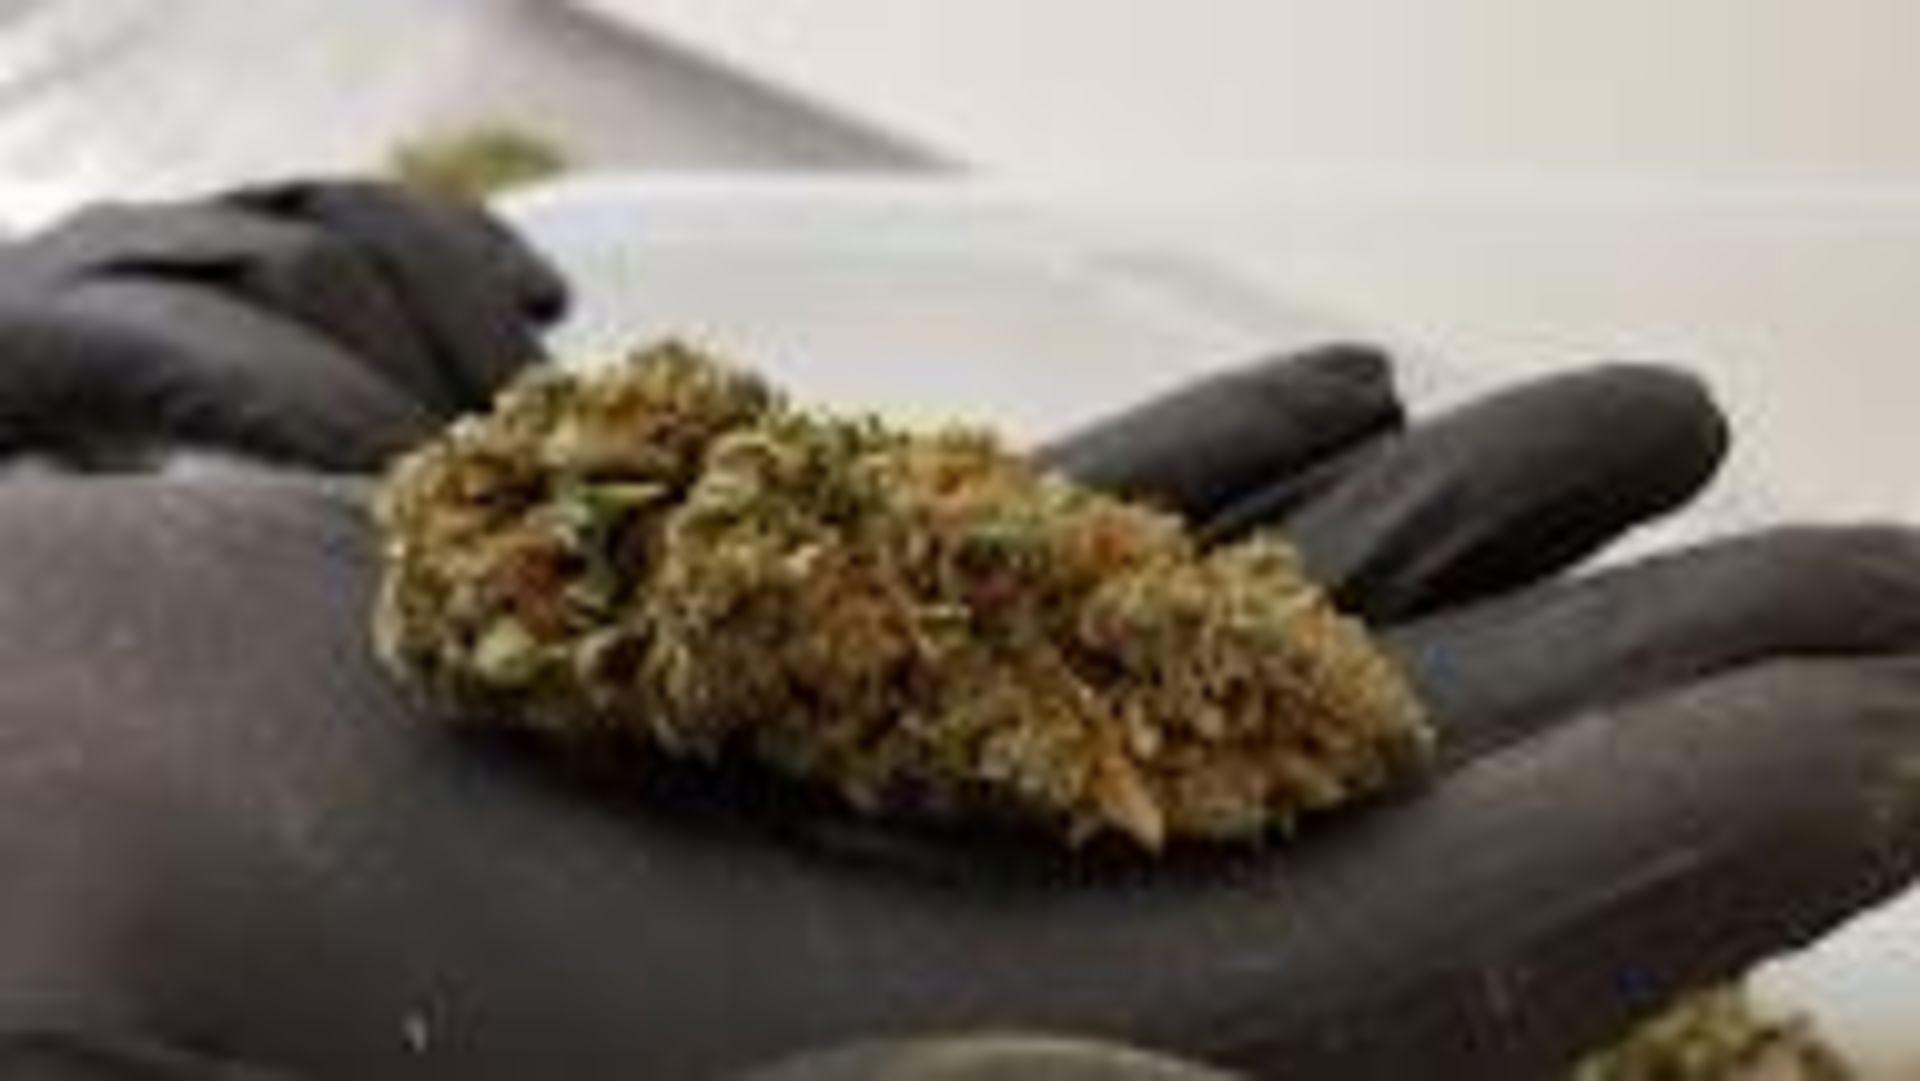 Unused/FactoryNew Revolution Cannabis & Hemp Flower Finisher System Model RDF 4300. Make $1,500/day - Image 24 of 32